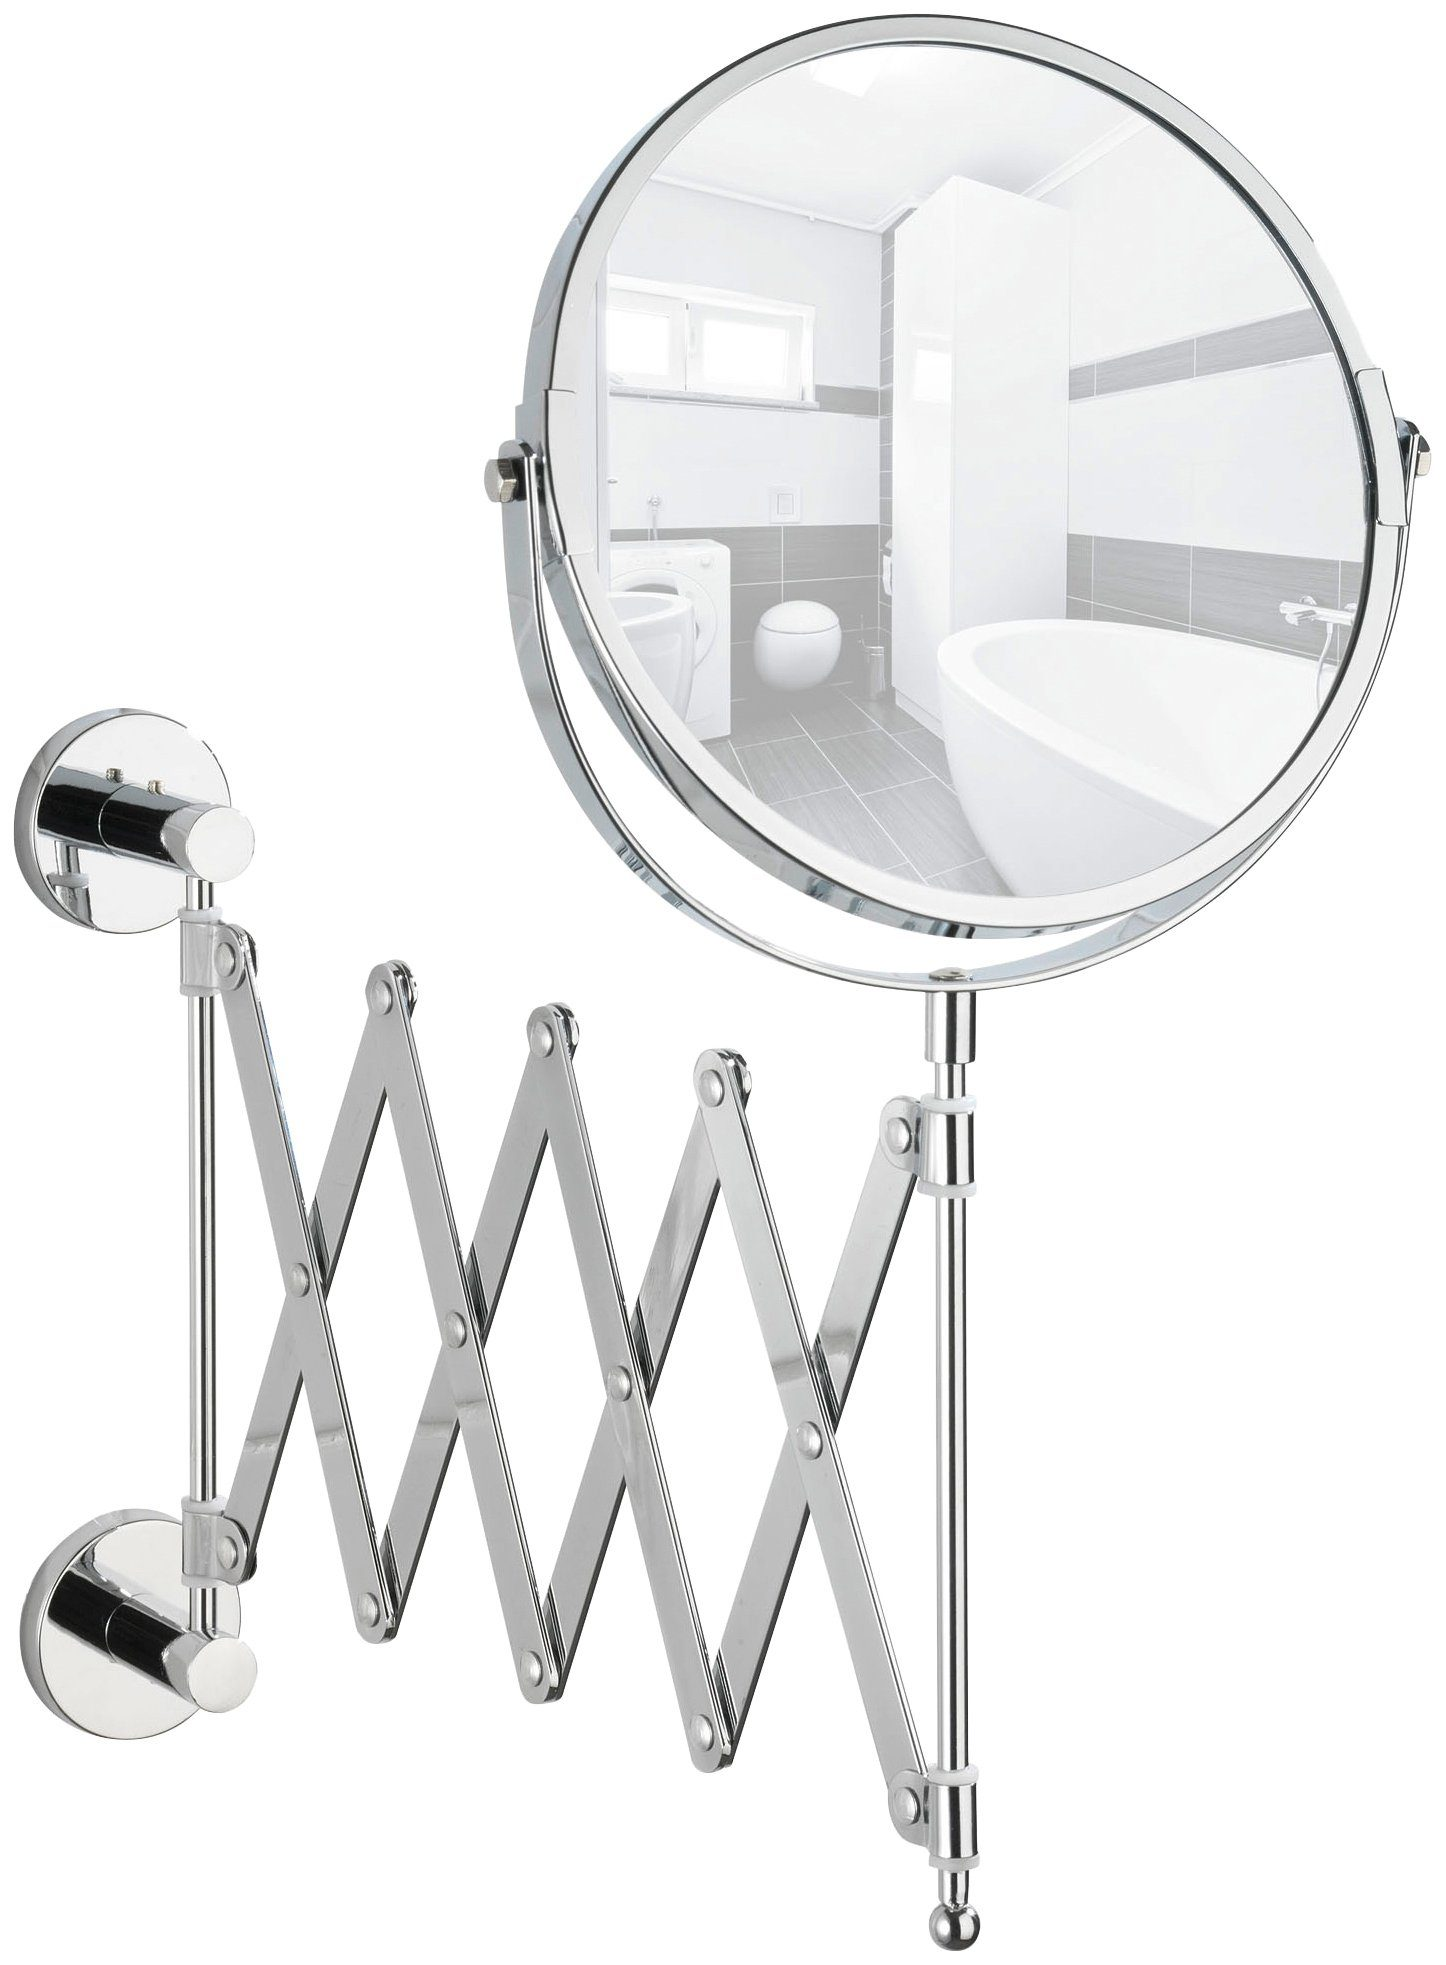 Kosmetikspiegel »Power-Loc Teleskop Kosmetikspiegel Elegance«